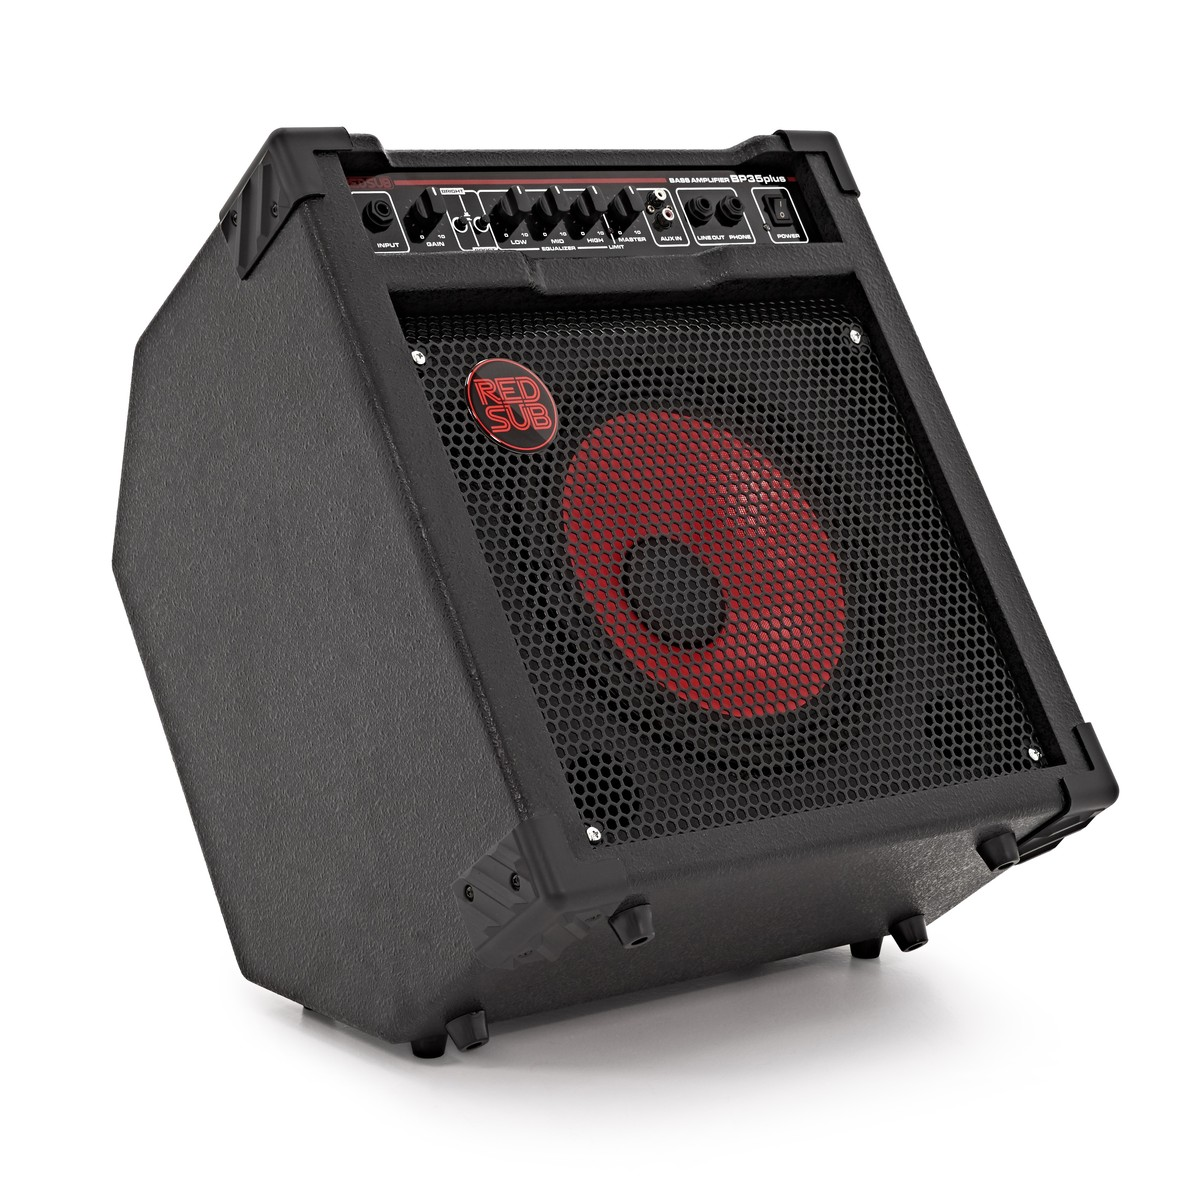 RedSub BP35plus 35W Bass Guitar Amplifier - Box Opened